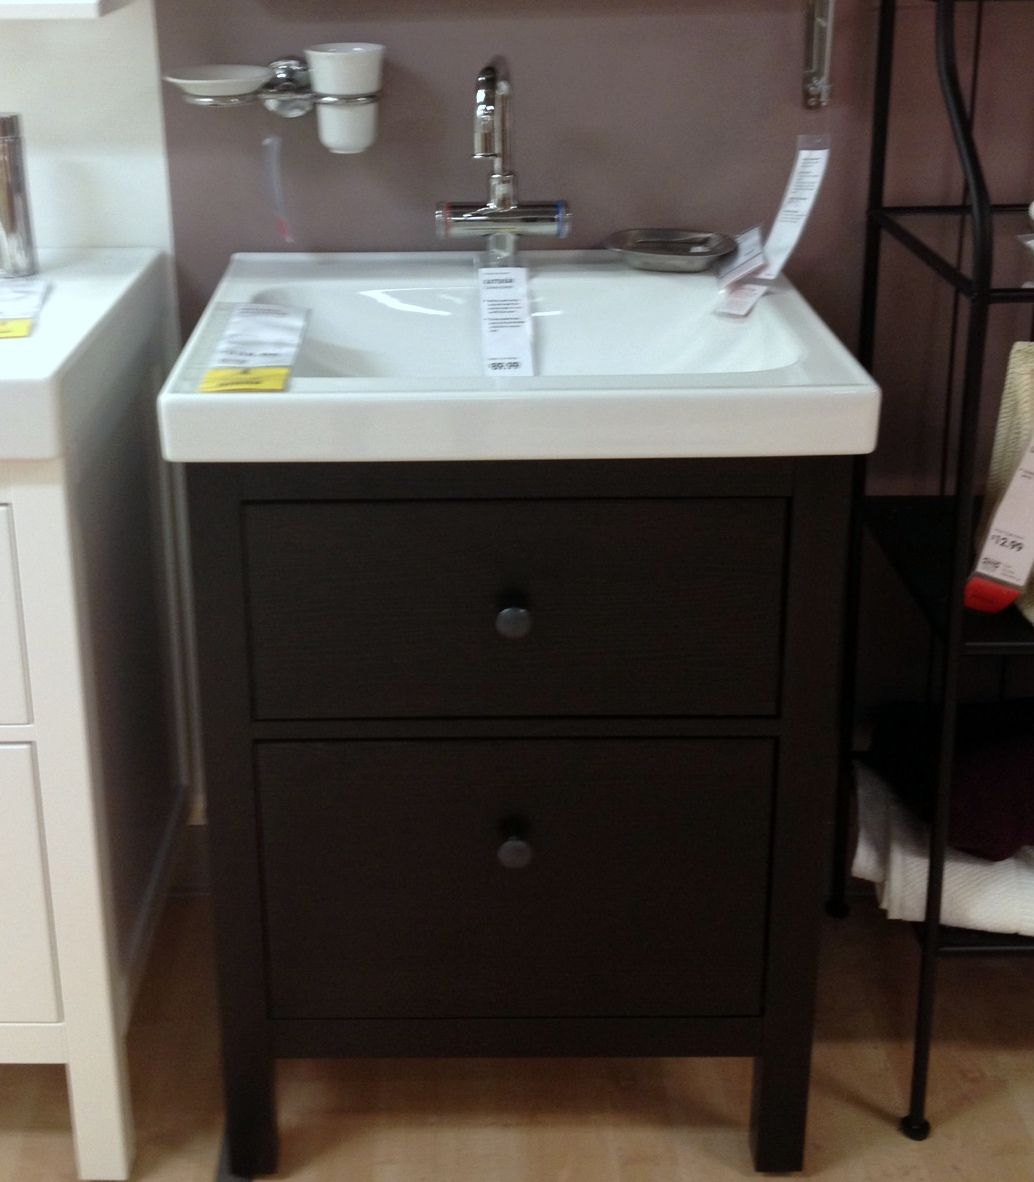 compact bathroom vanity ikea bathroom vanities ikea on ikea bathroom vanities id=63872